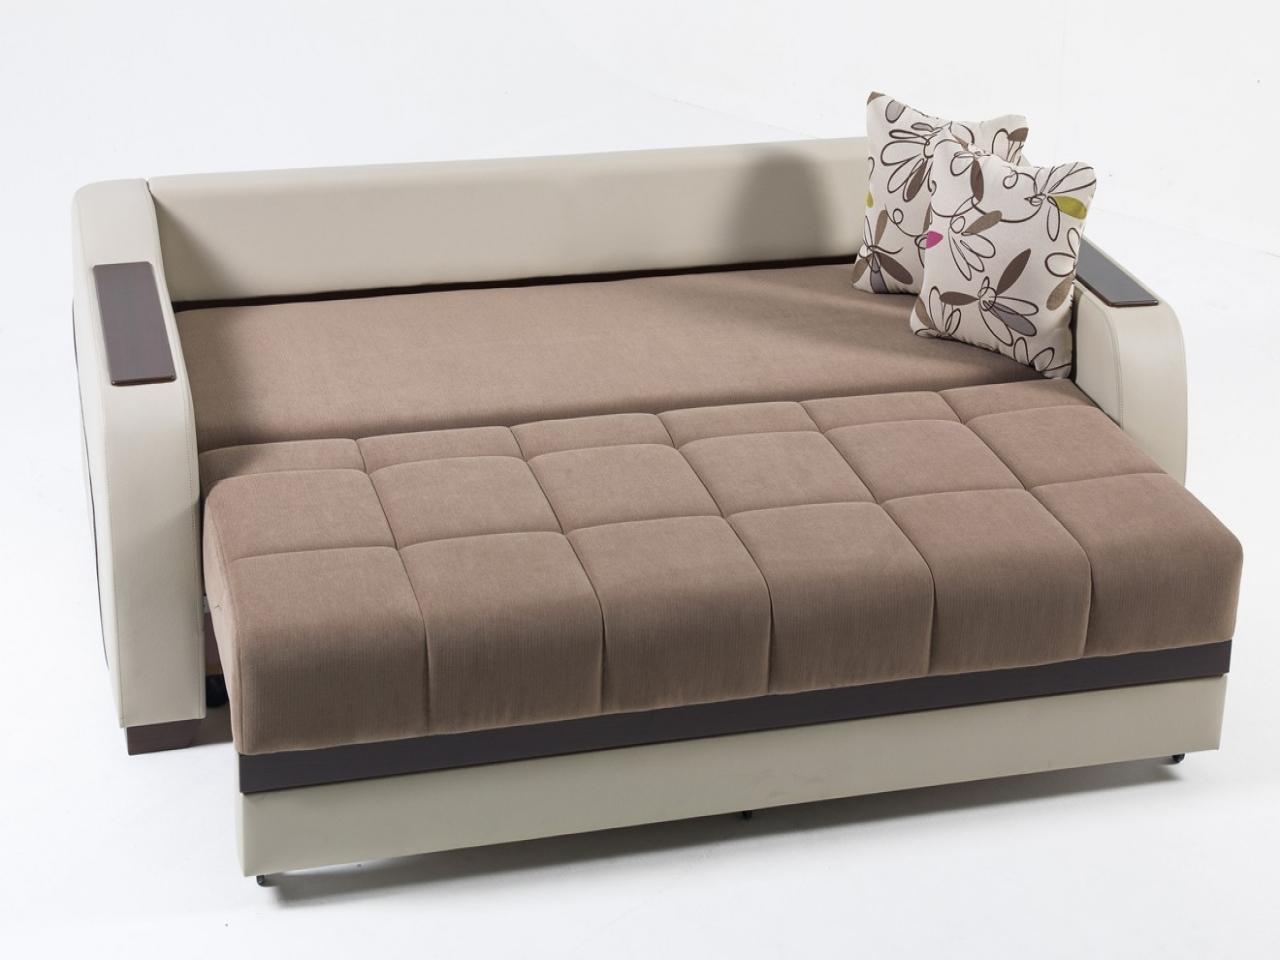 2019 Latest Comfortable Convertible Sofas Sofa Ideas